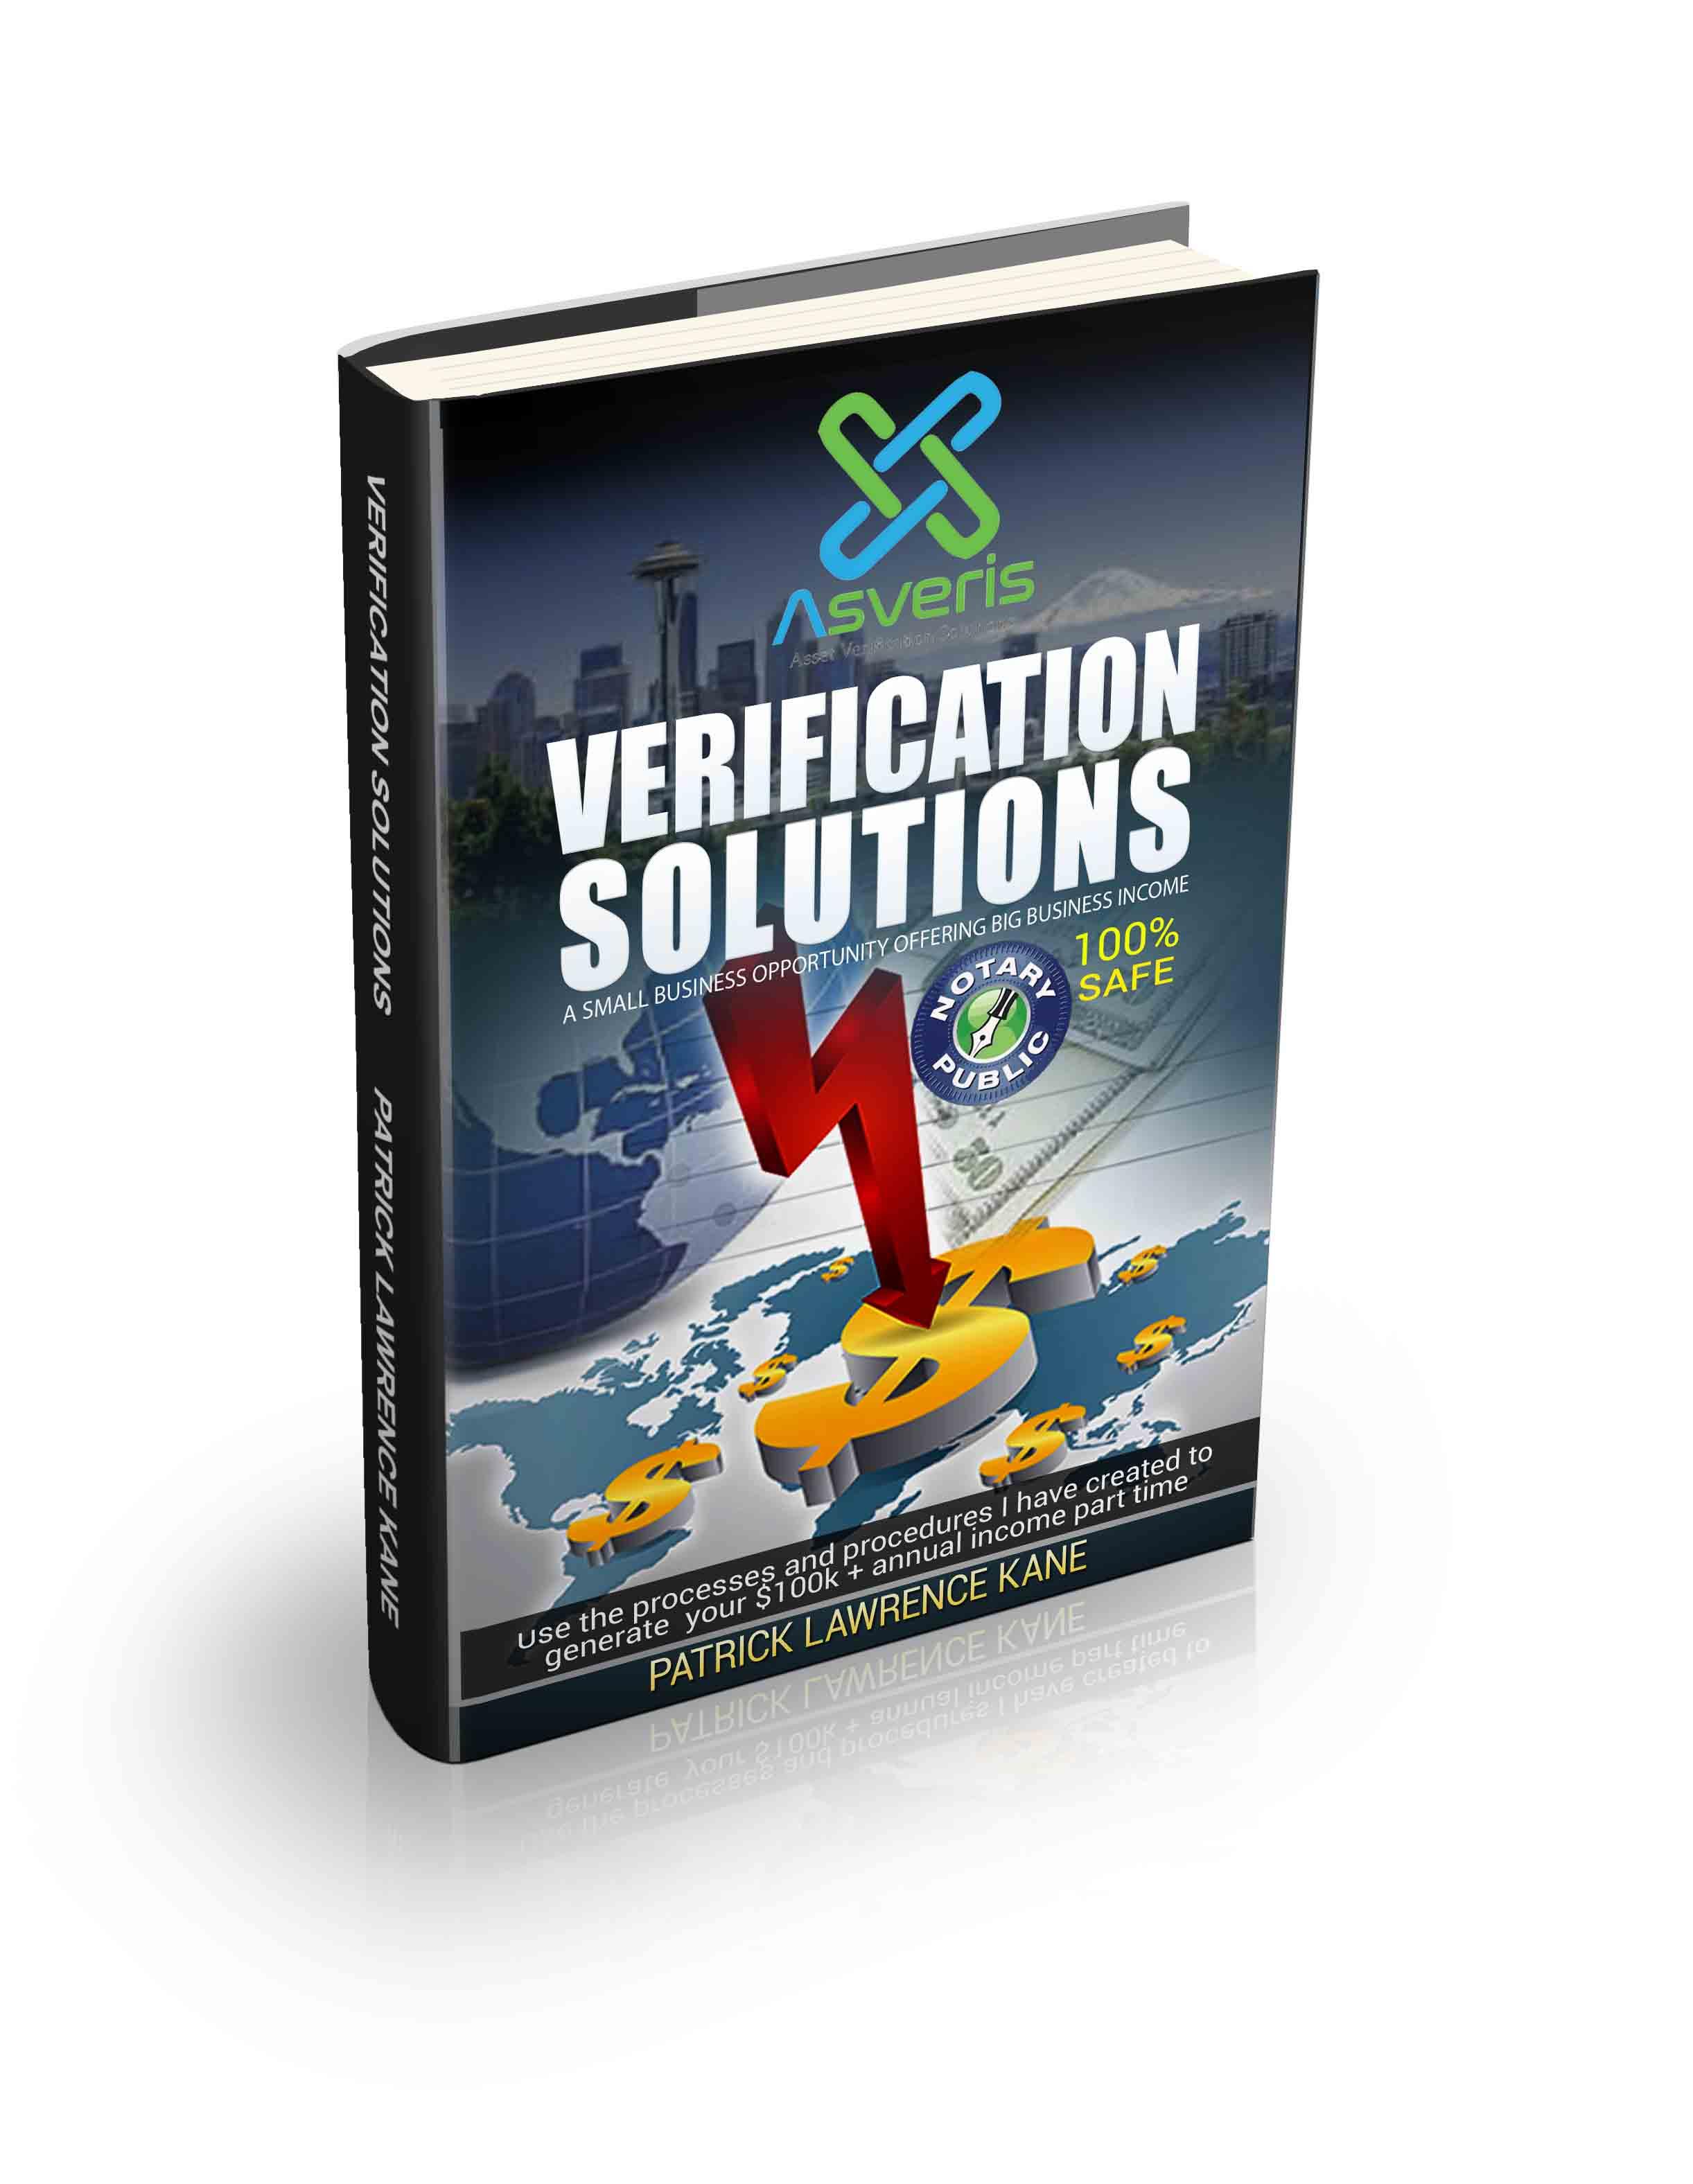 ASveris book cover 2.jpg